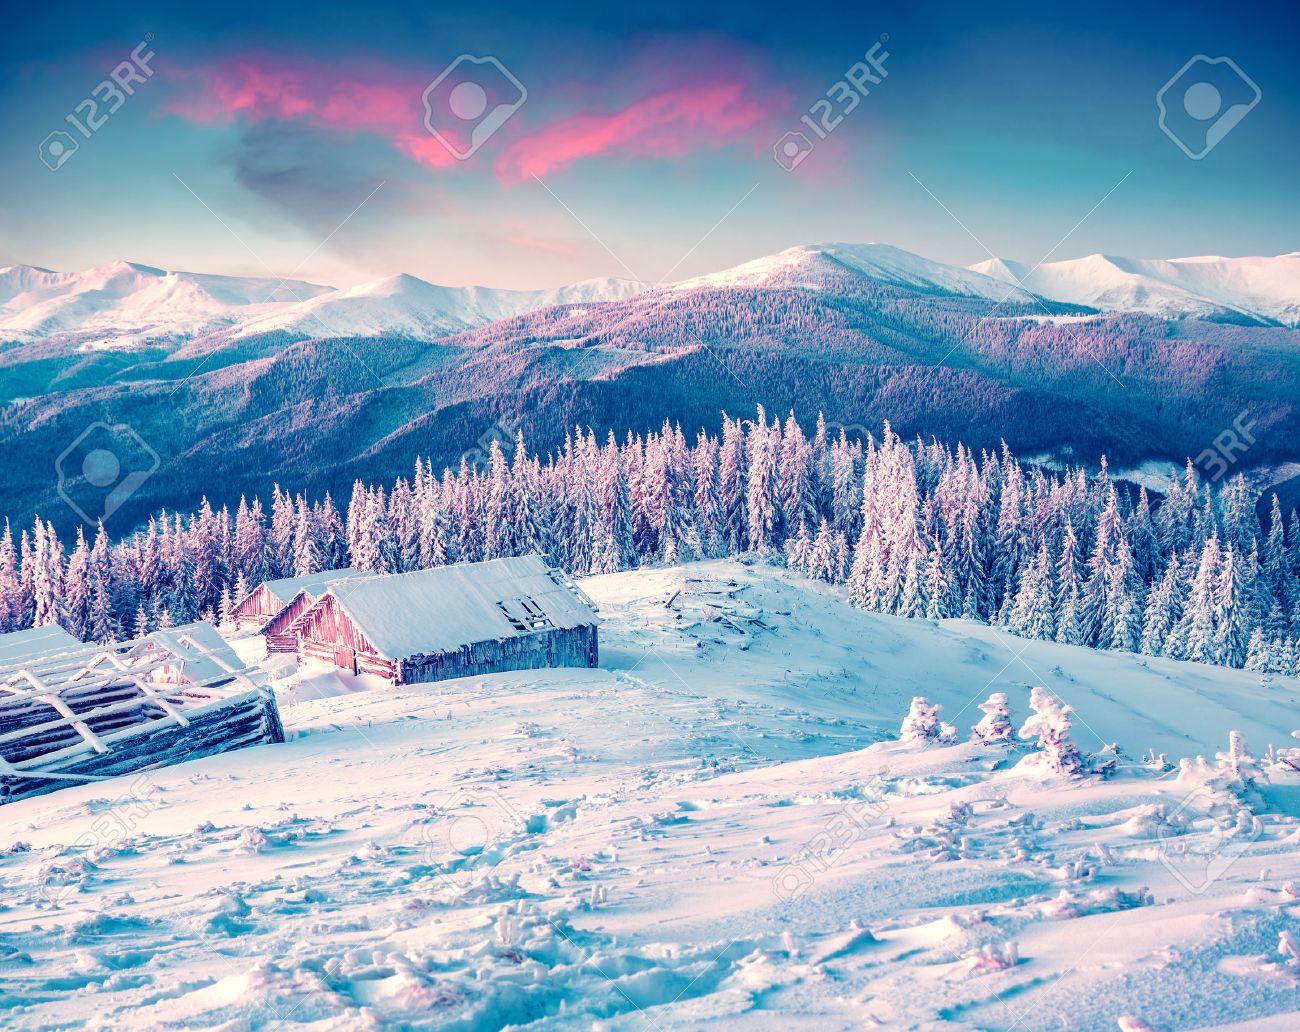 Colorful winter morning in the Carpathian mountains. Glade Pozharska, Carpathian, Ukraine, Europe. - 45895528